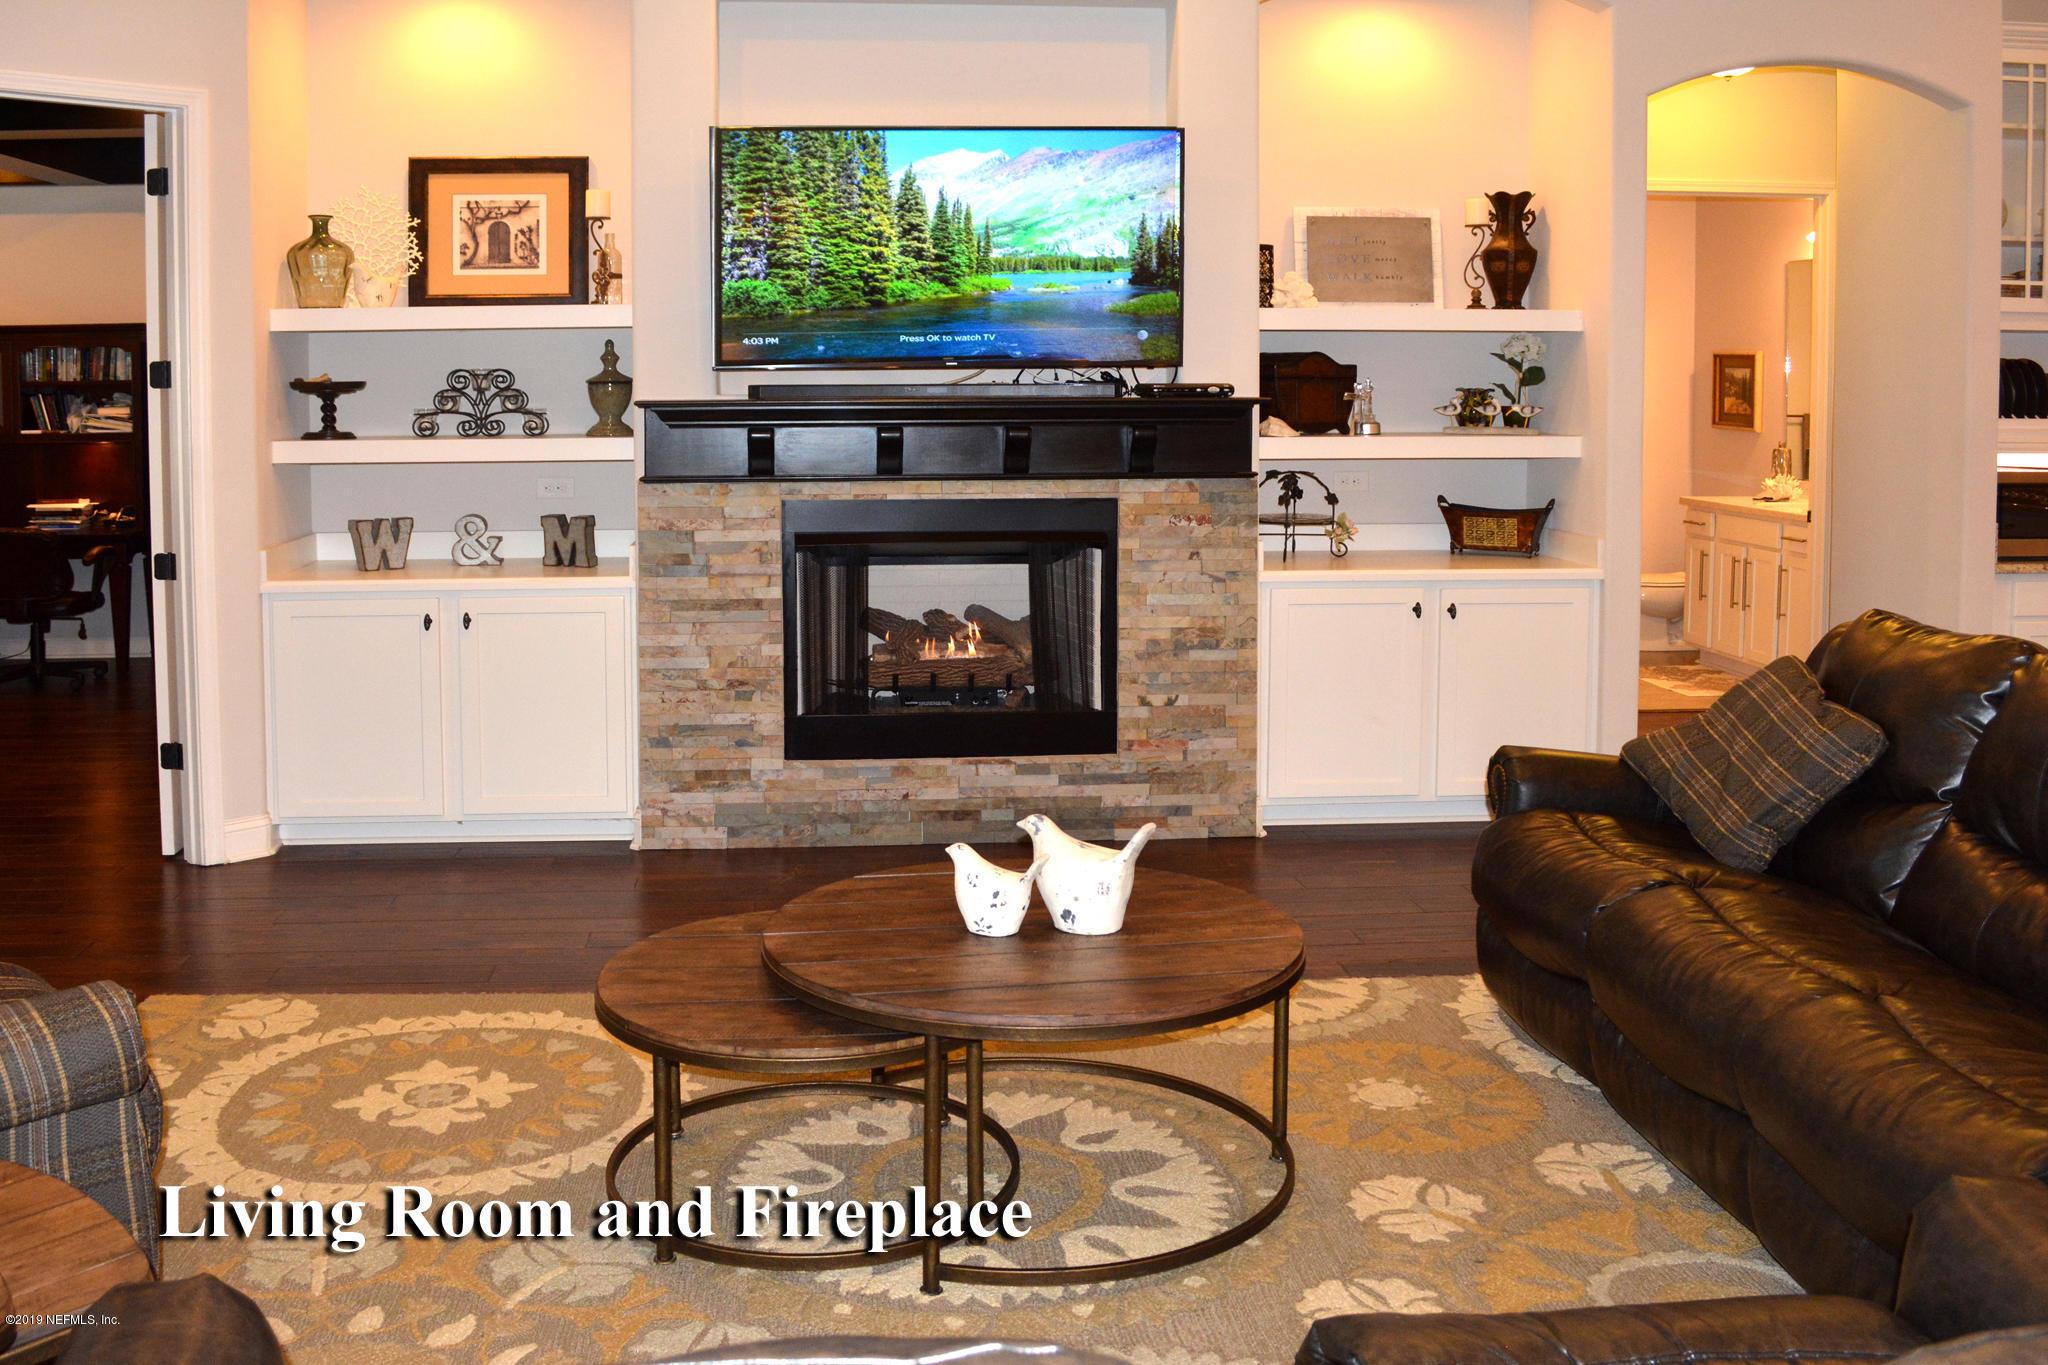 30 SENEGAL, PONTE VEDRA BEACH, FLORIDA 32081, 5 Bedrooms Bedrooms, ,5 BathroomsBathrooms,Residential - single family,For sale,SENEGAL,977260